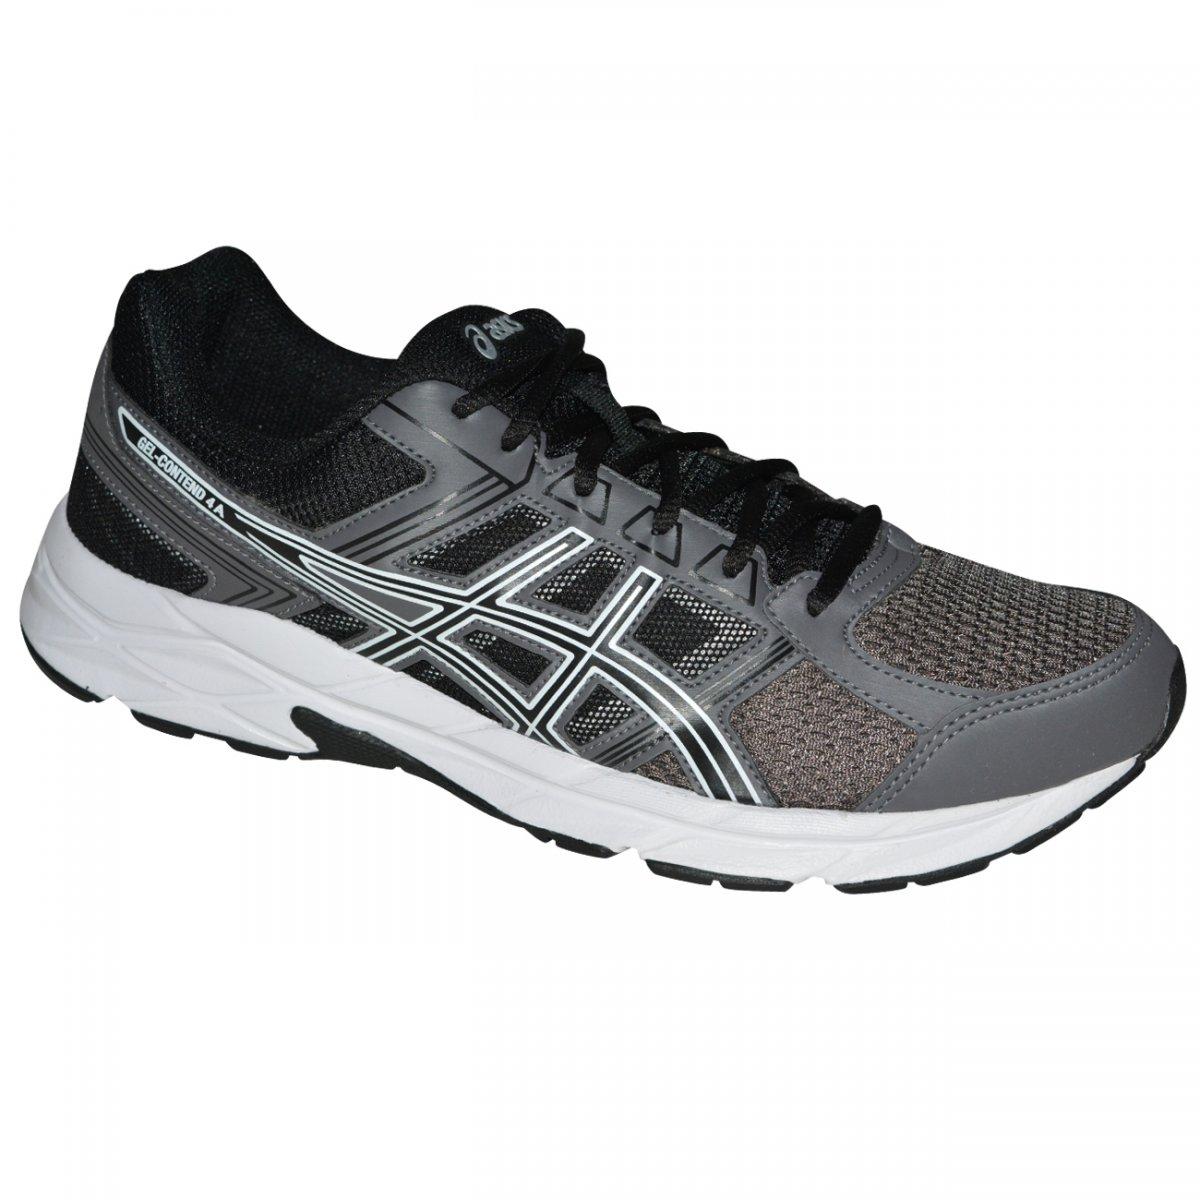 Tenis Asics Gel-contend 4 T026A 9290 - Grafite preto branco - Chuteira  Nike a4d1e69073b5c